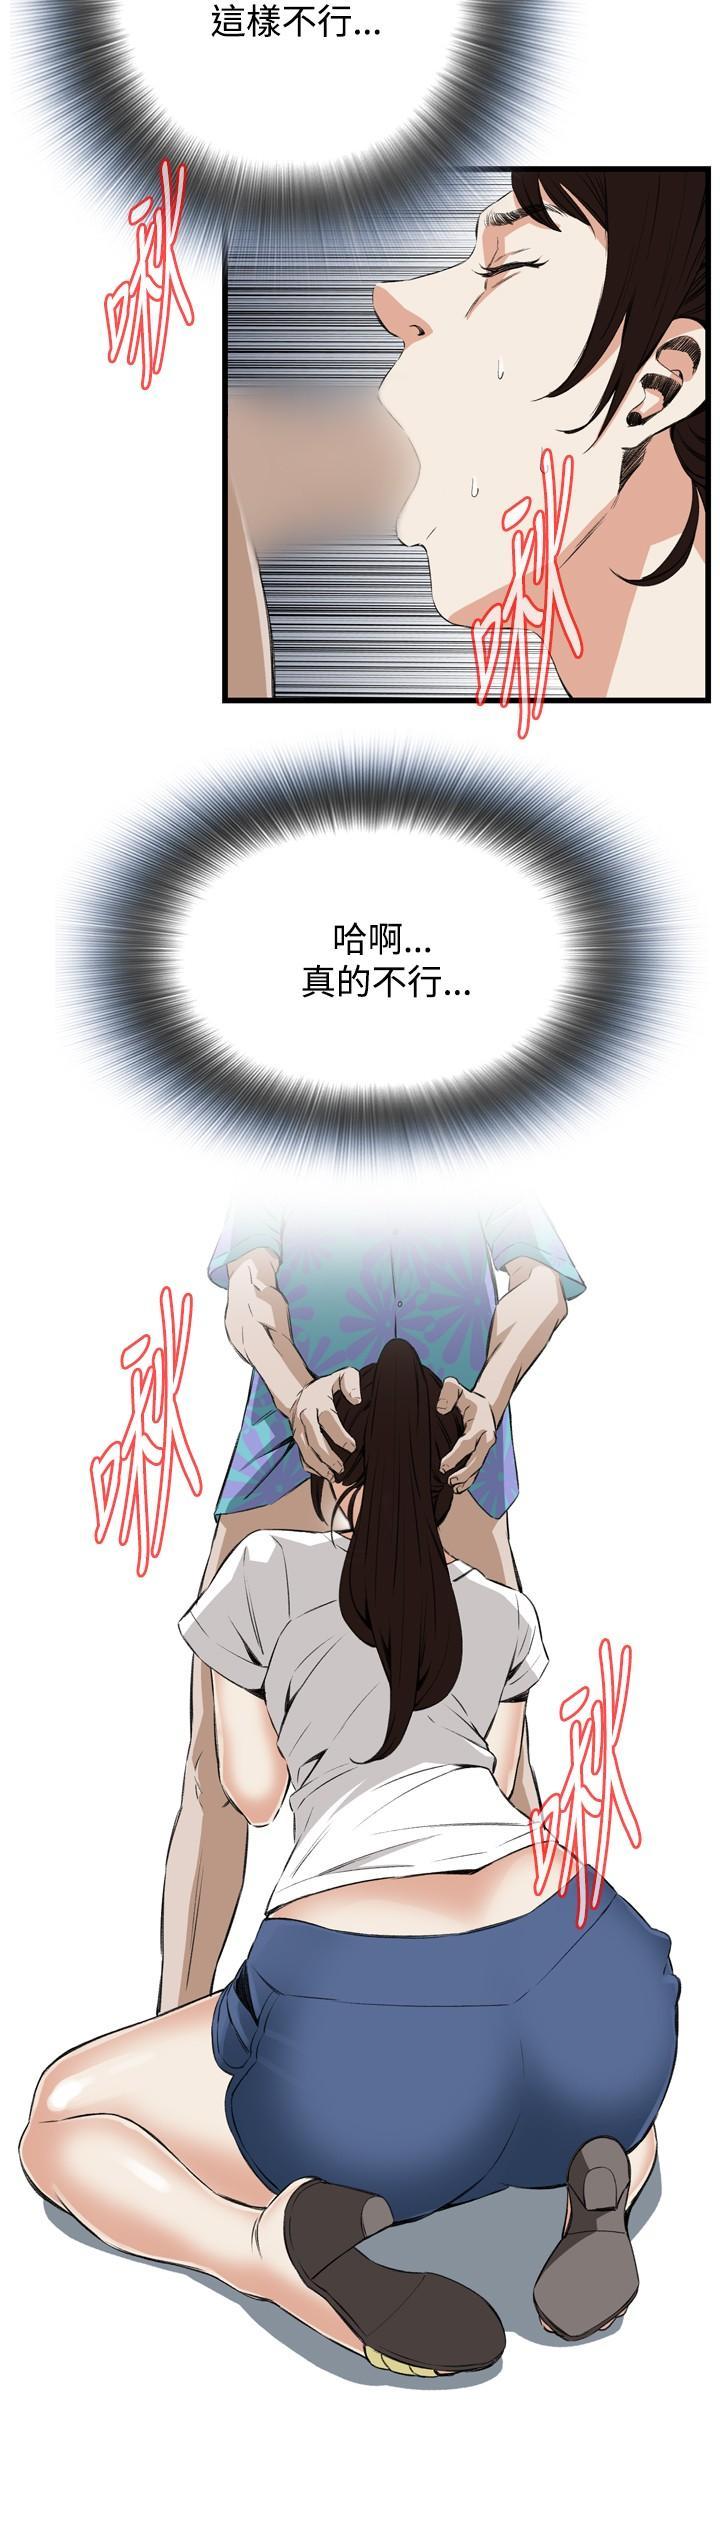 Take a Peek 偷窥 Ch.39~51 [Chinese]中文 358